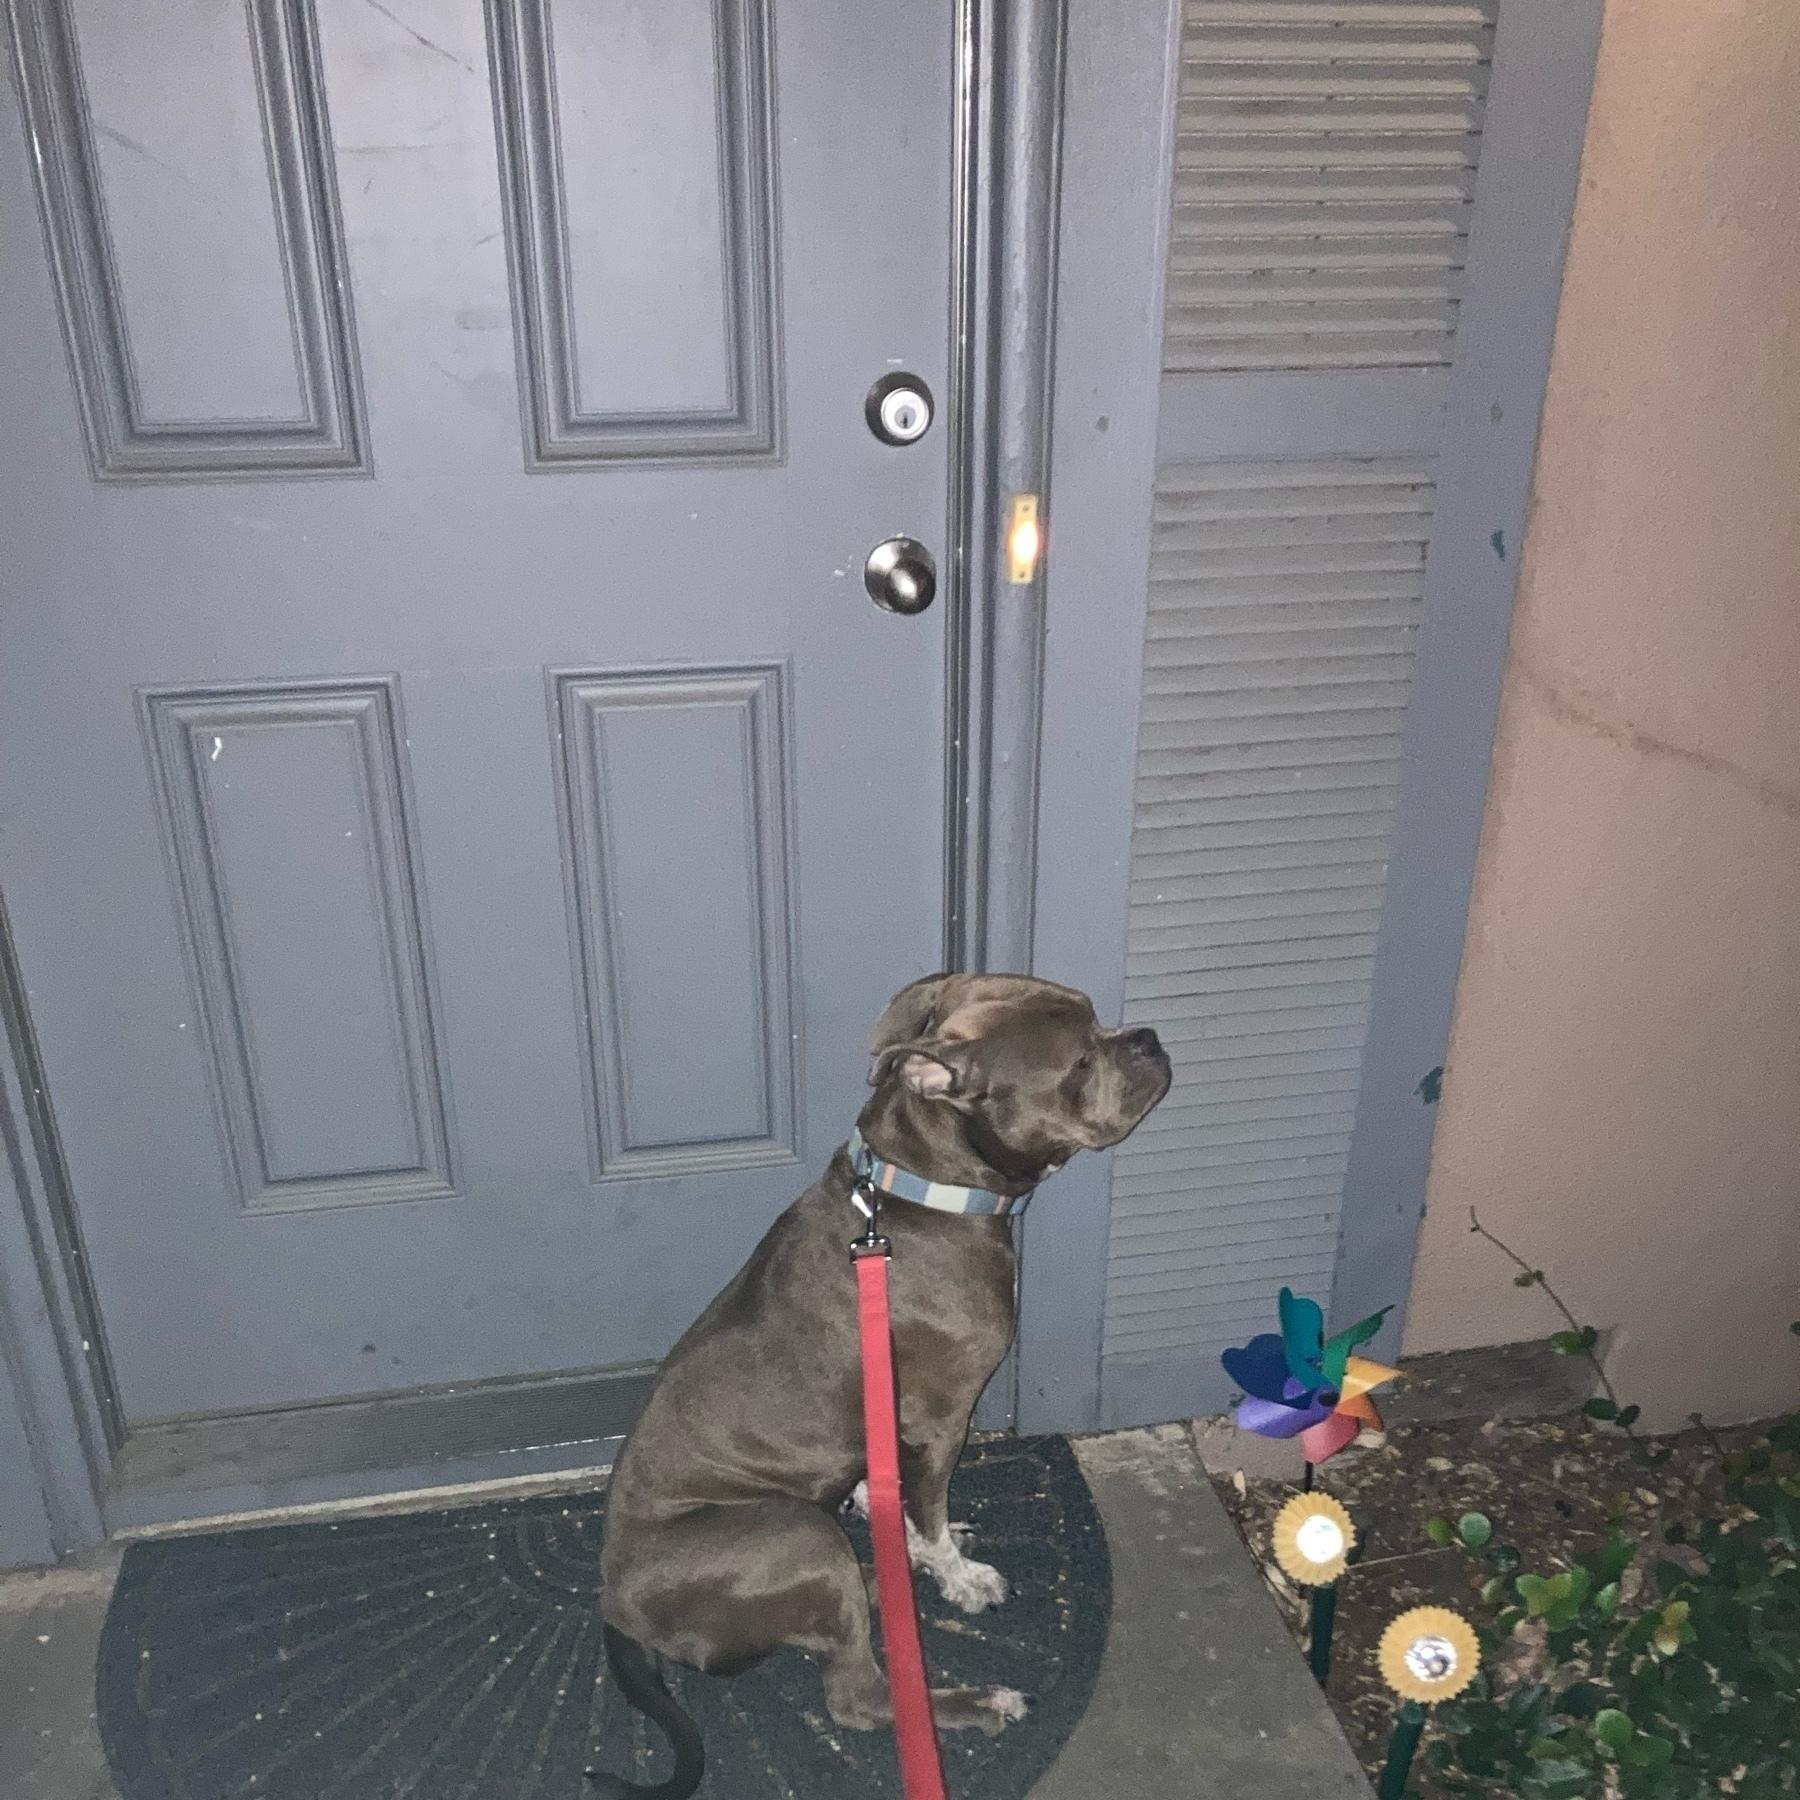 Dog sitting outside of door.